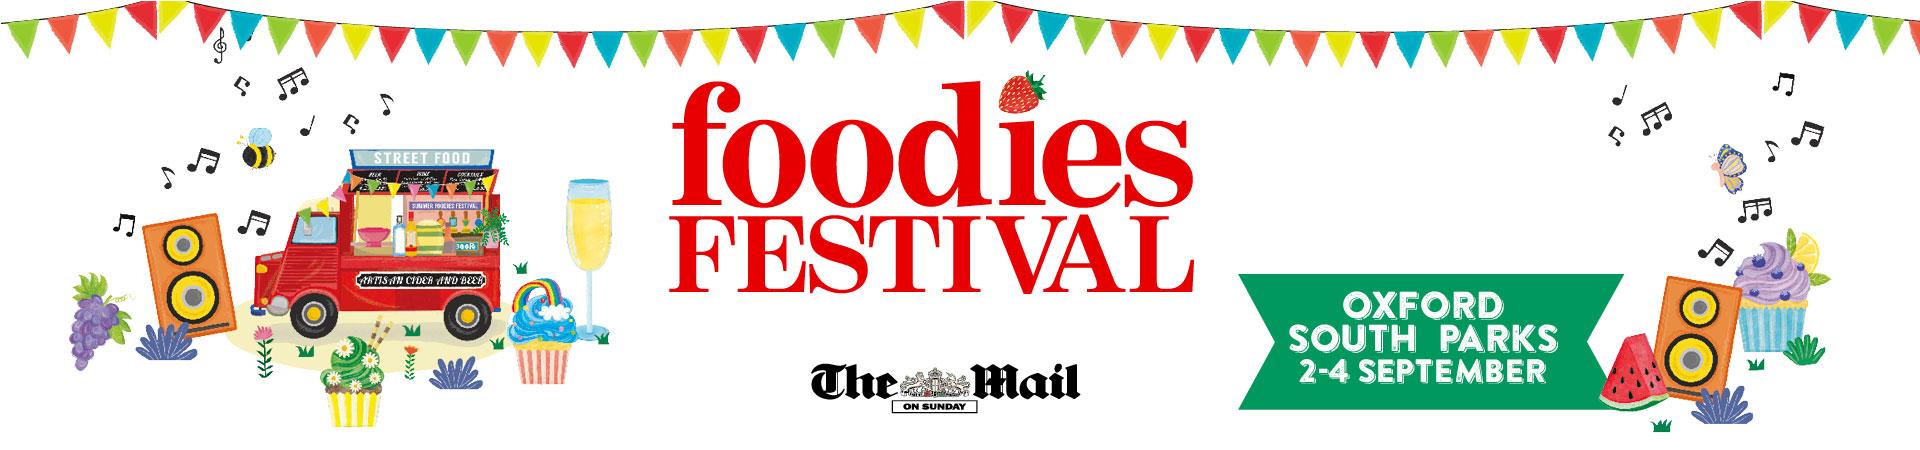 Oxford Food Festival